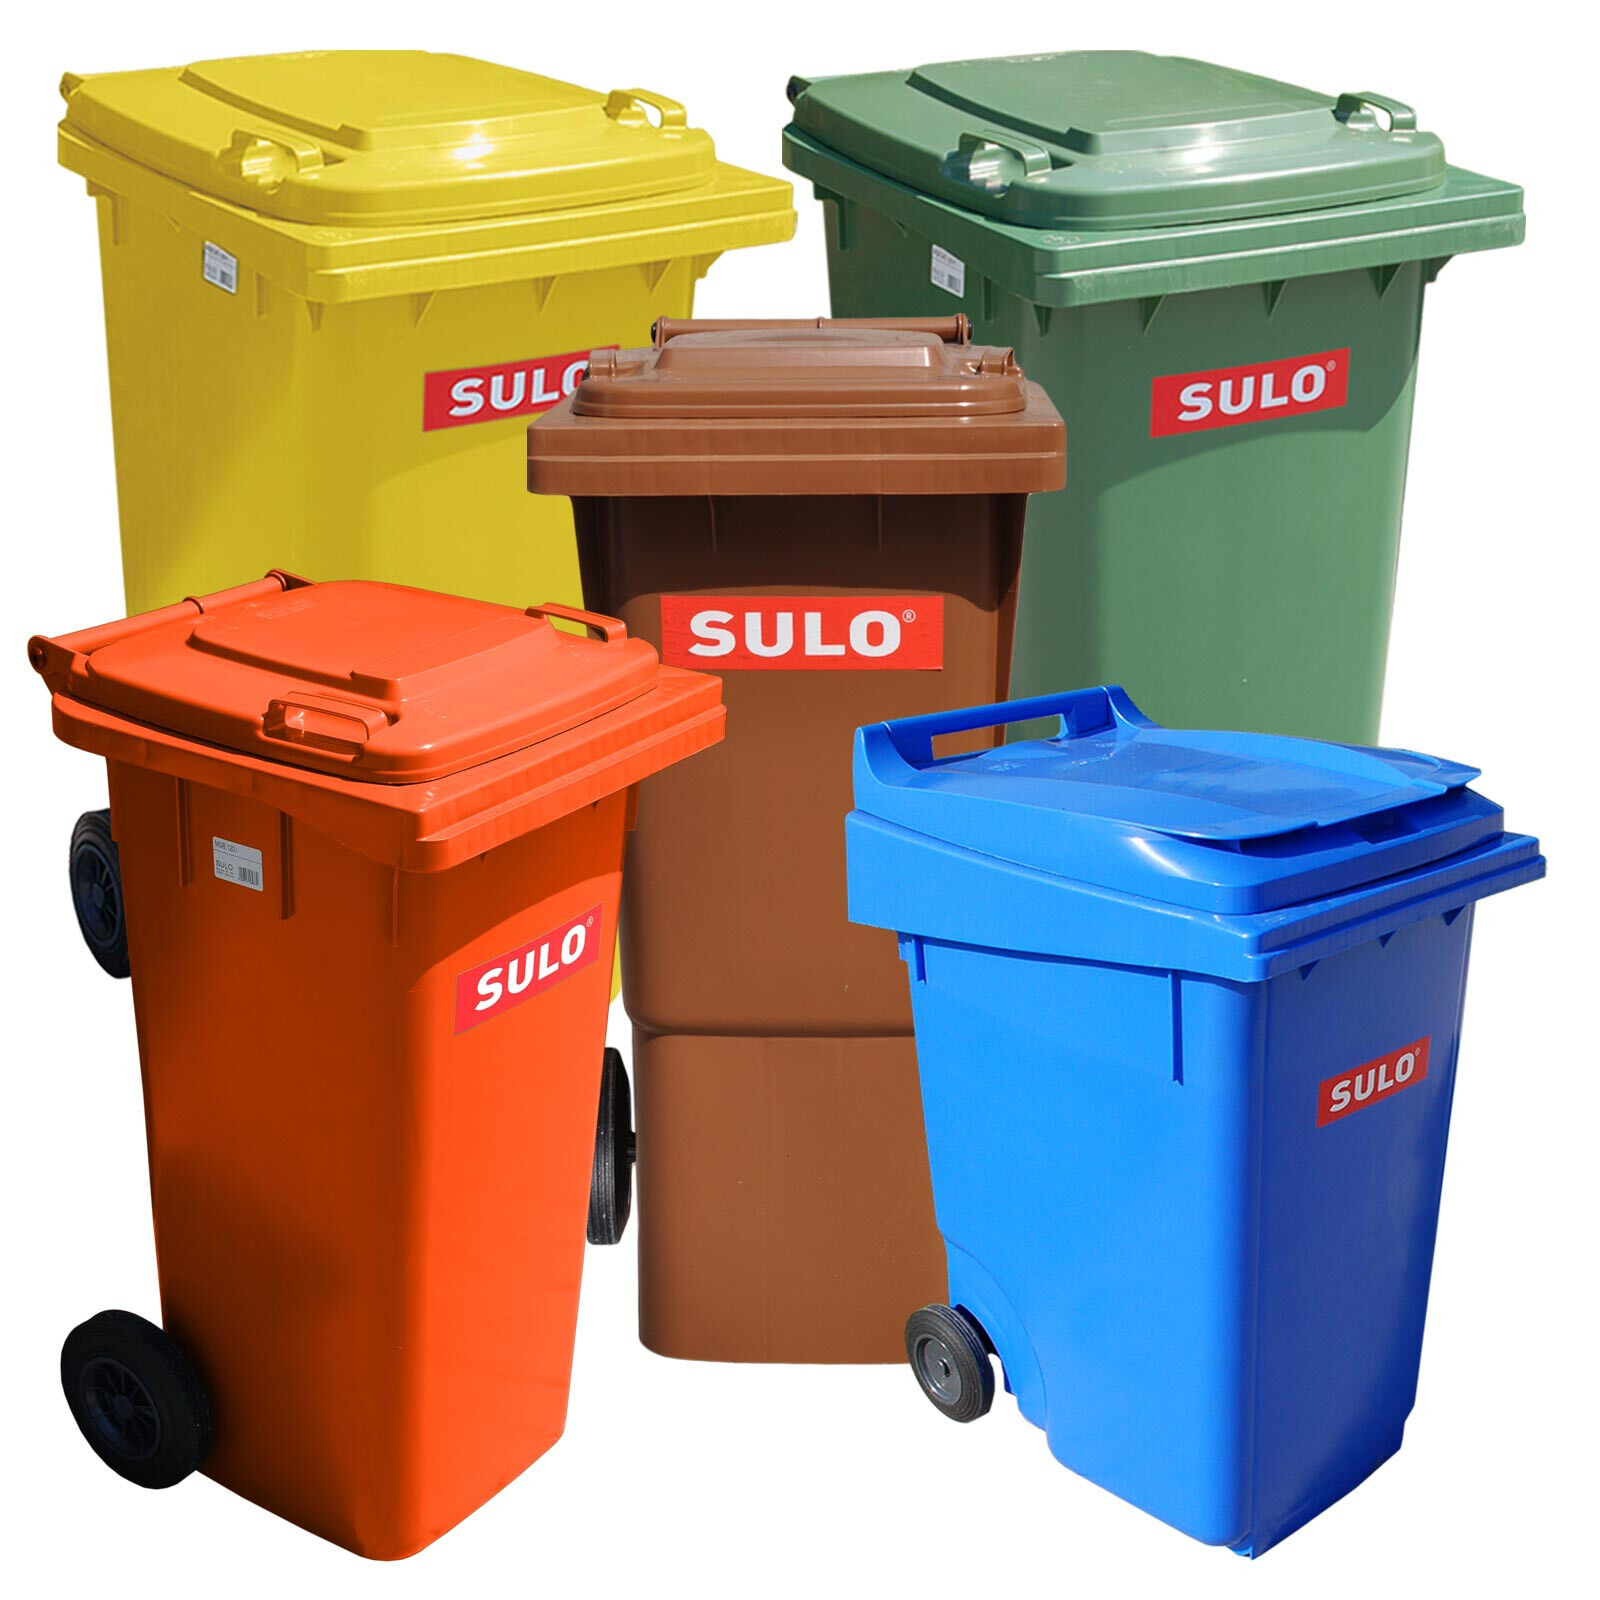 SULO Abfalltonne Müllbehälter Mülltonne 60-360 Liter NEU Made in Germany